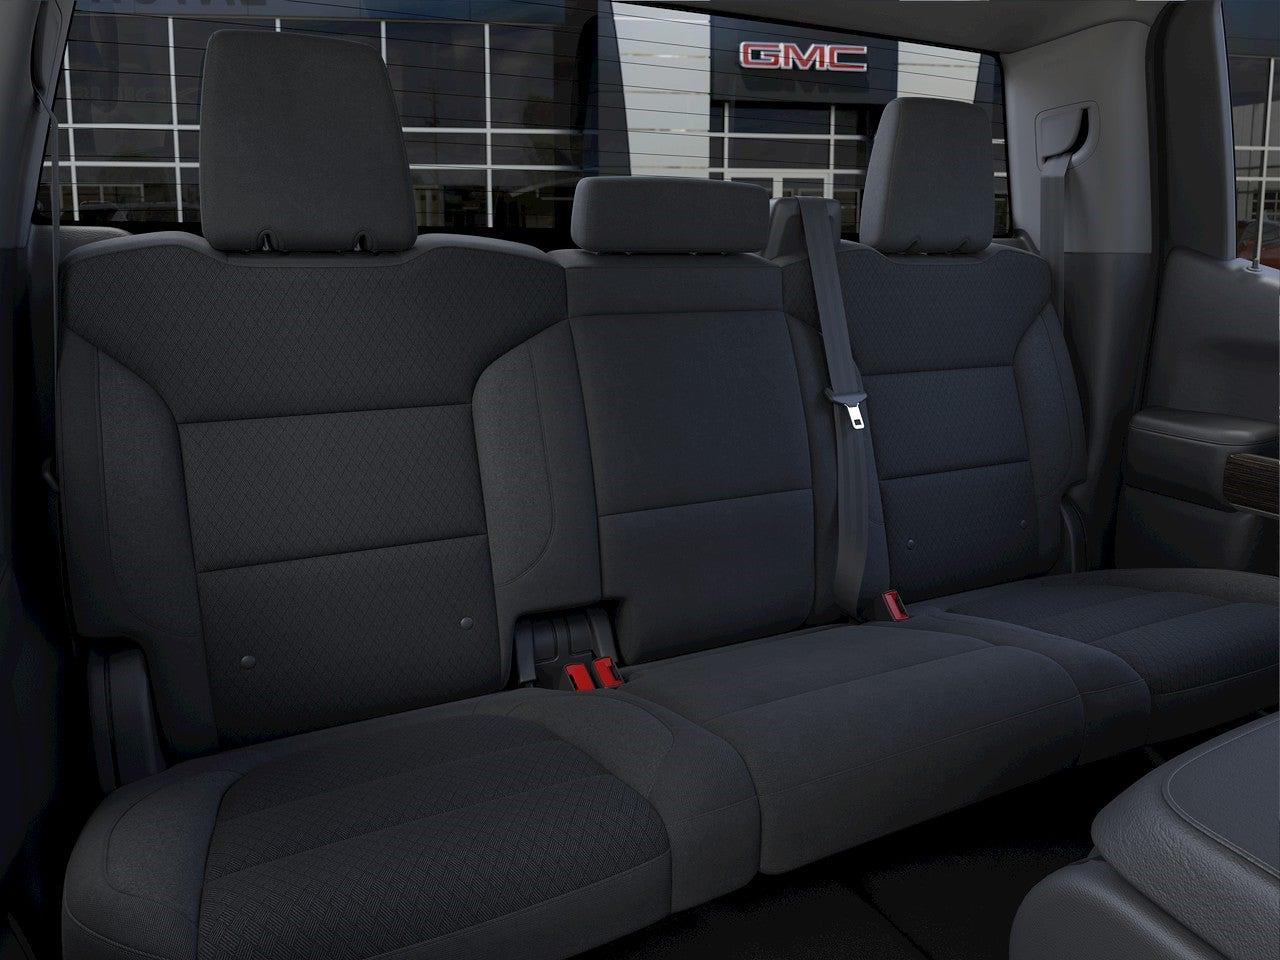 2021 GMC Sierra 1500 Double Cab 4x4, Pickup #V21148 - photo 14